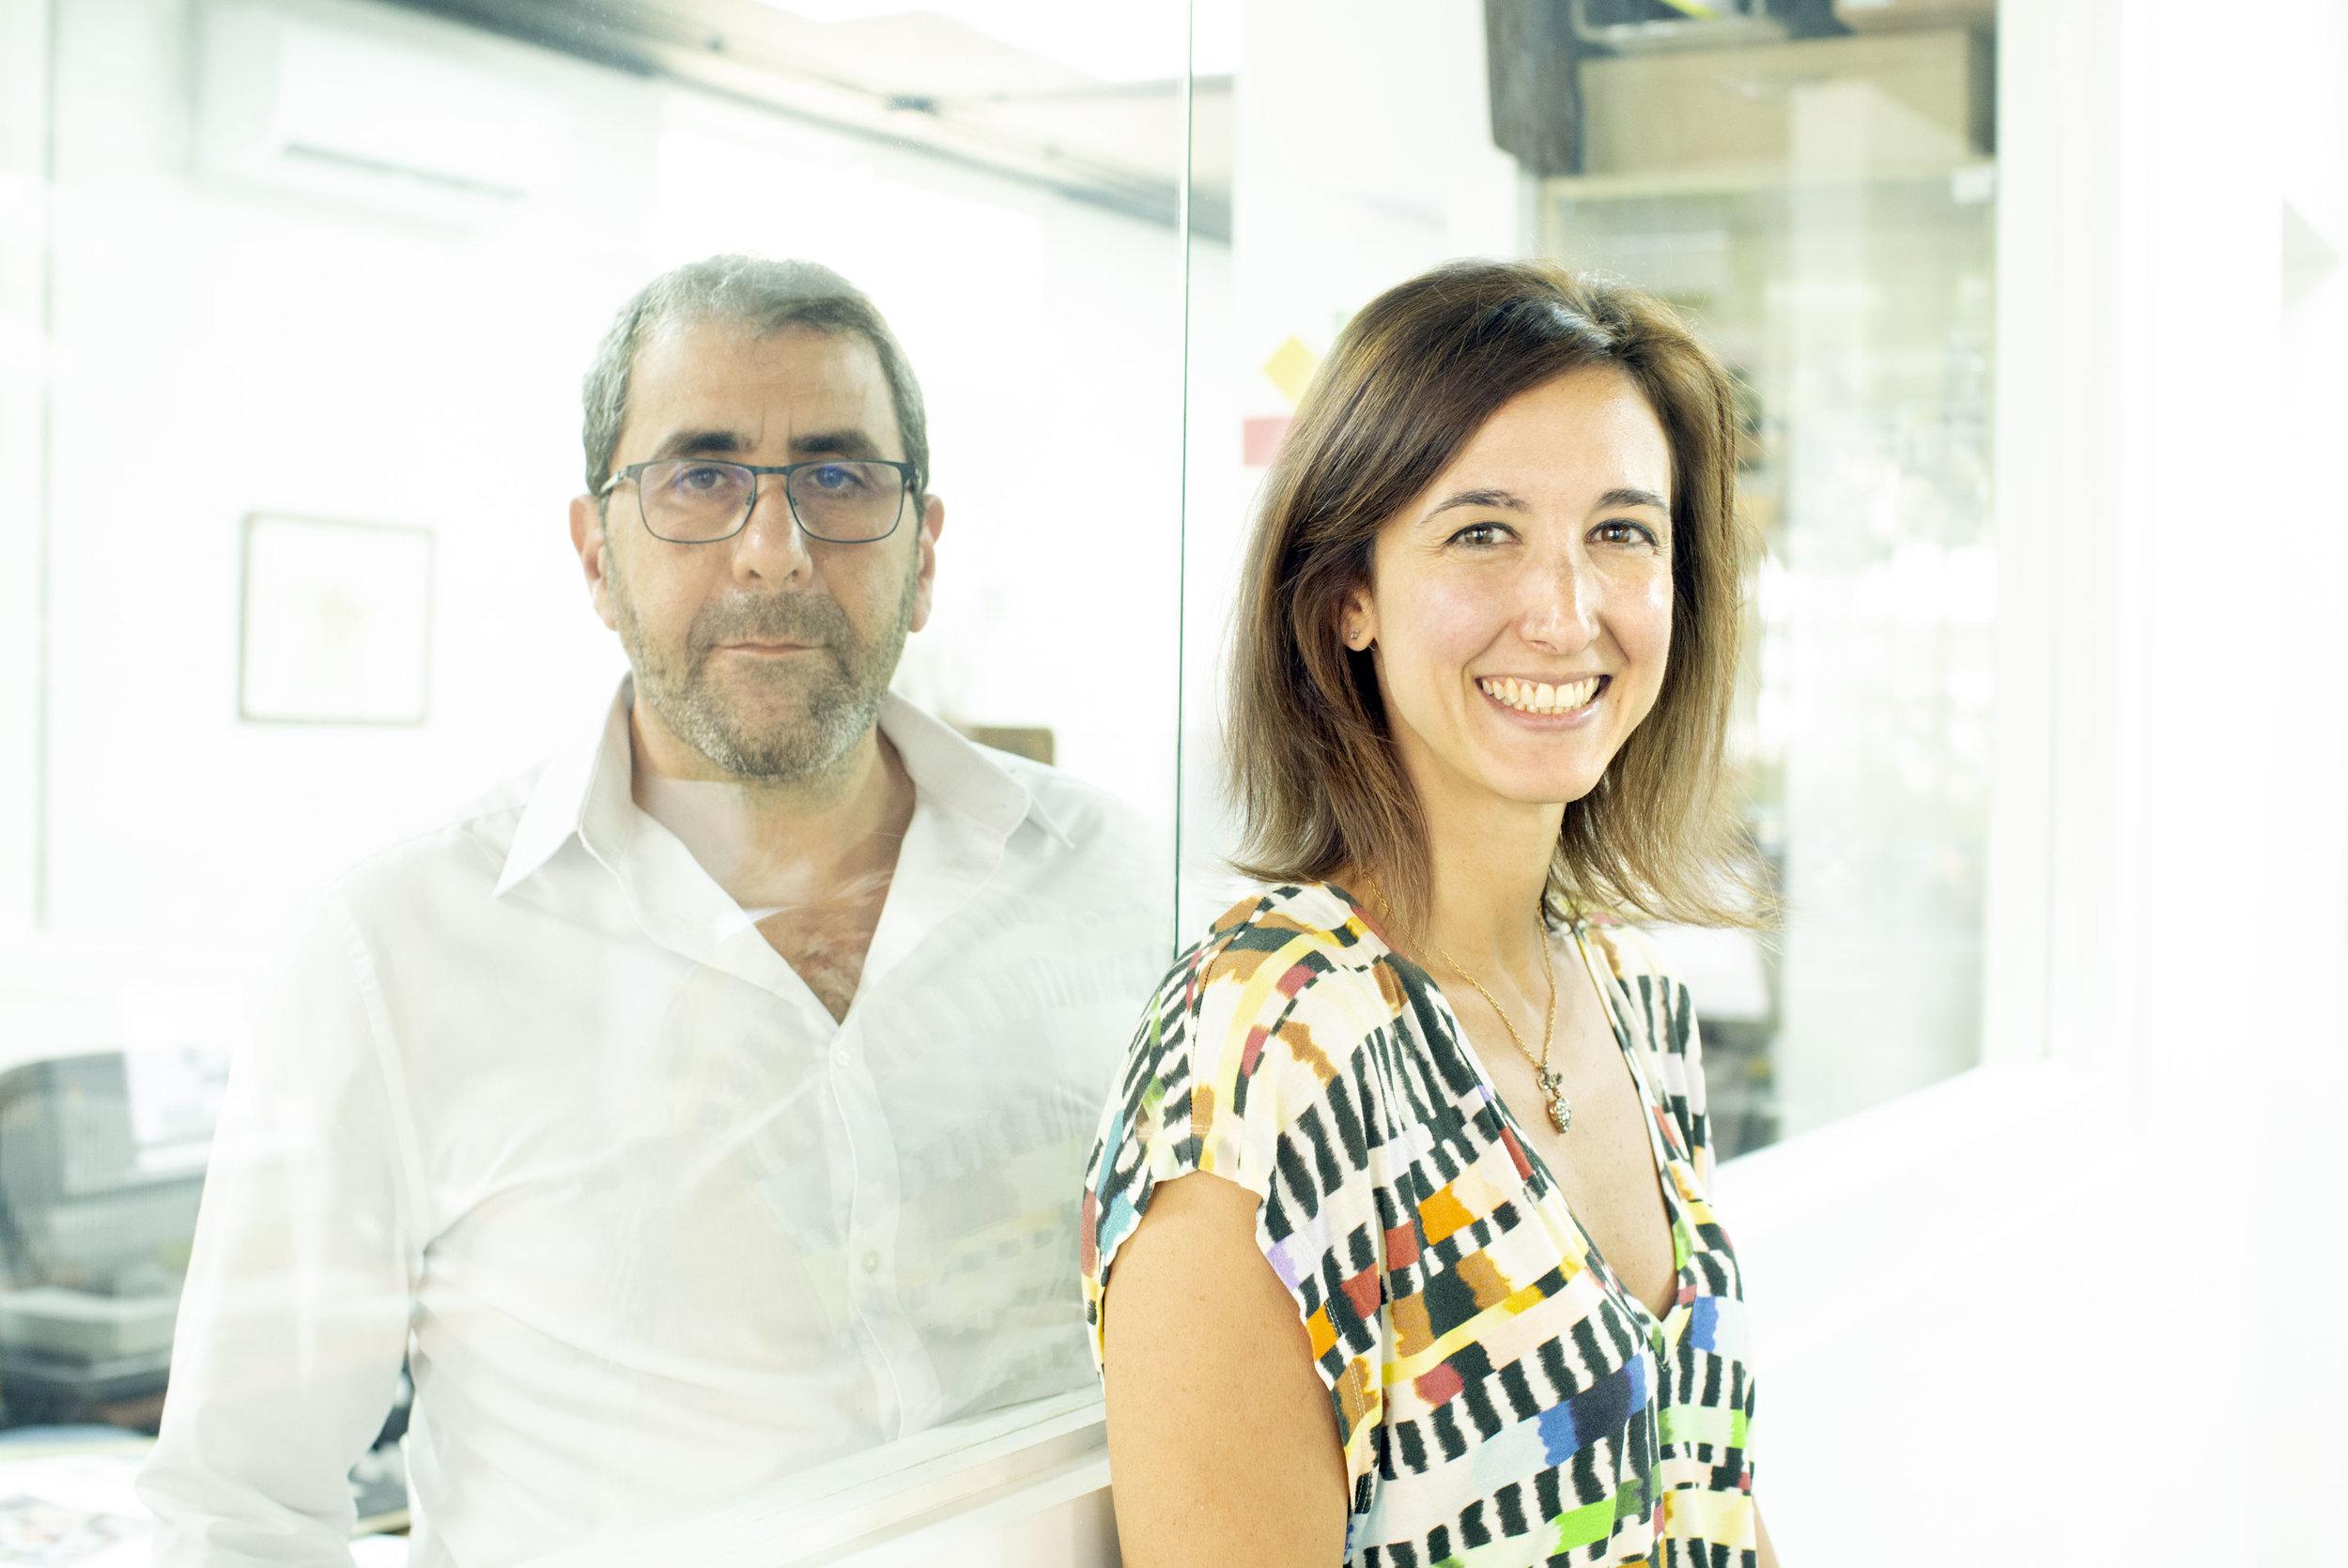 Tania Arwachan and Nadim Zablit